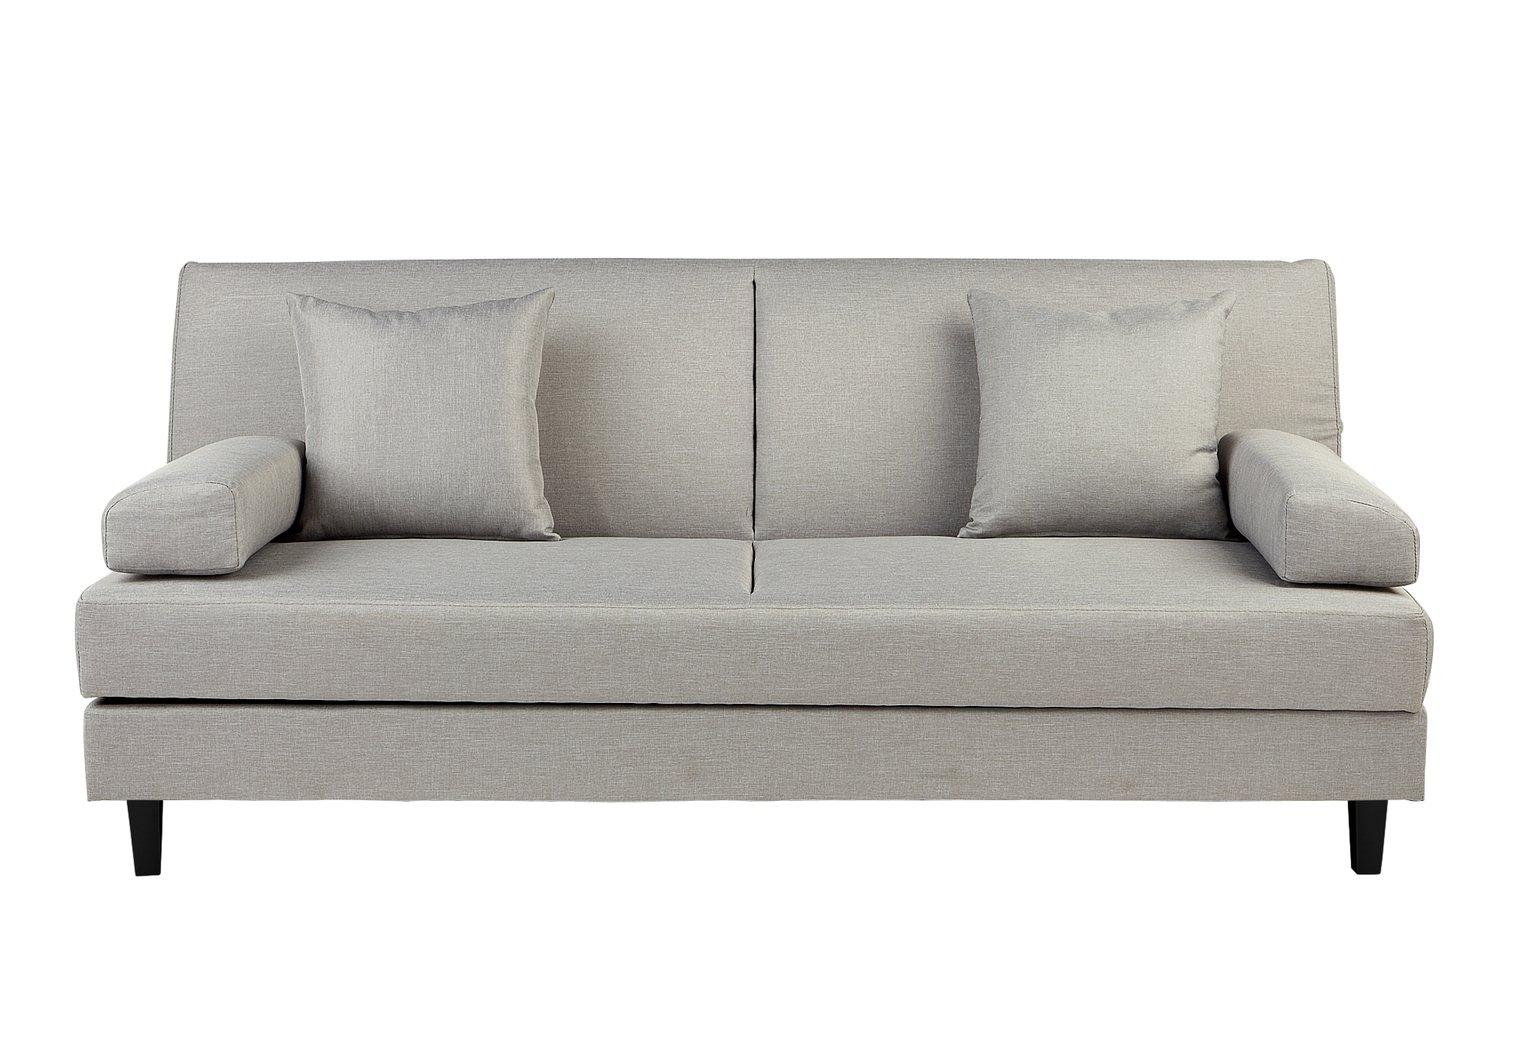 Buy Argos Home Chase Fabric Clic Clac Sofa Bed Light Grey Sofa